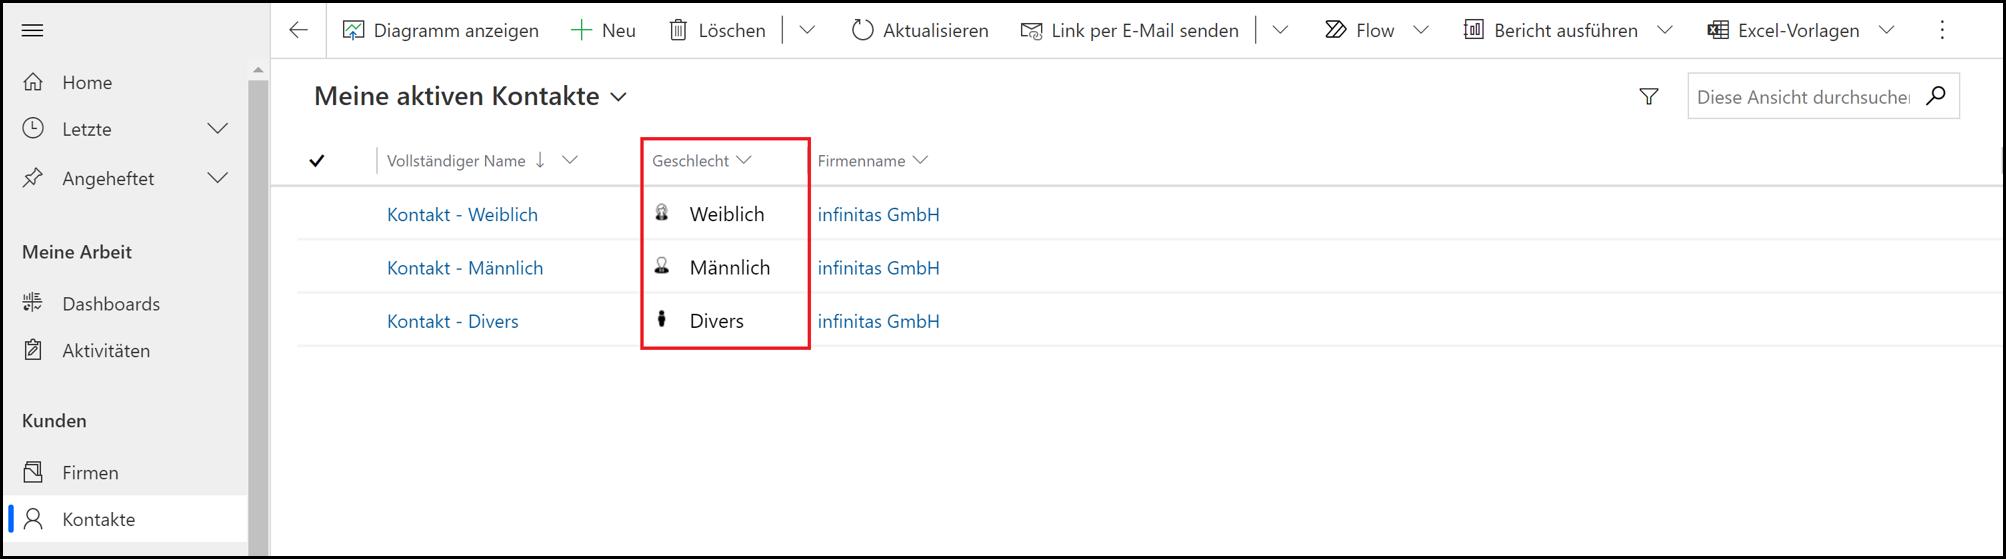 Microsoft_Dynamics _365_Grafiken_in_Ansichtsspalten_hinzufuegen_Abb7